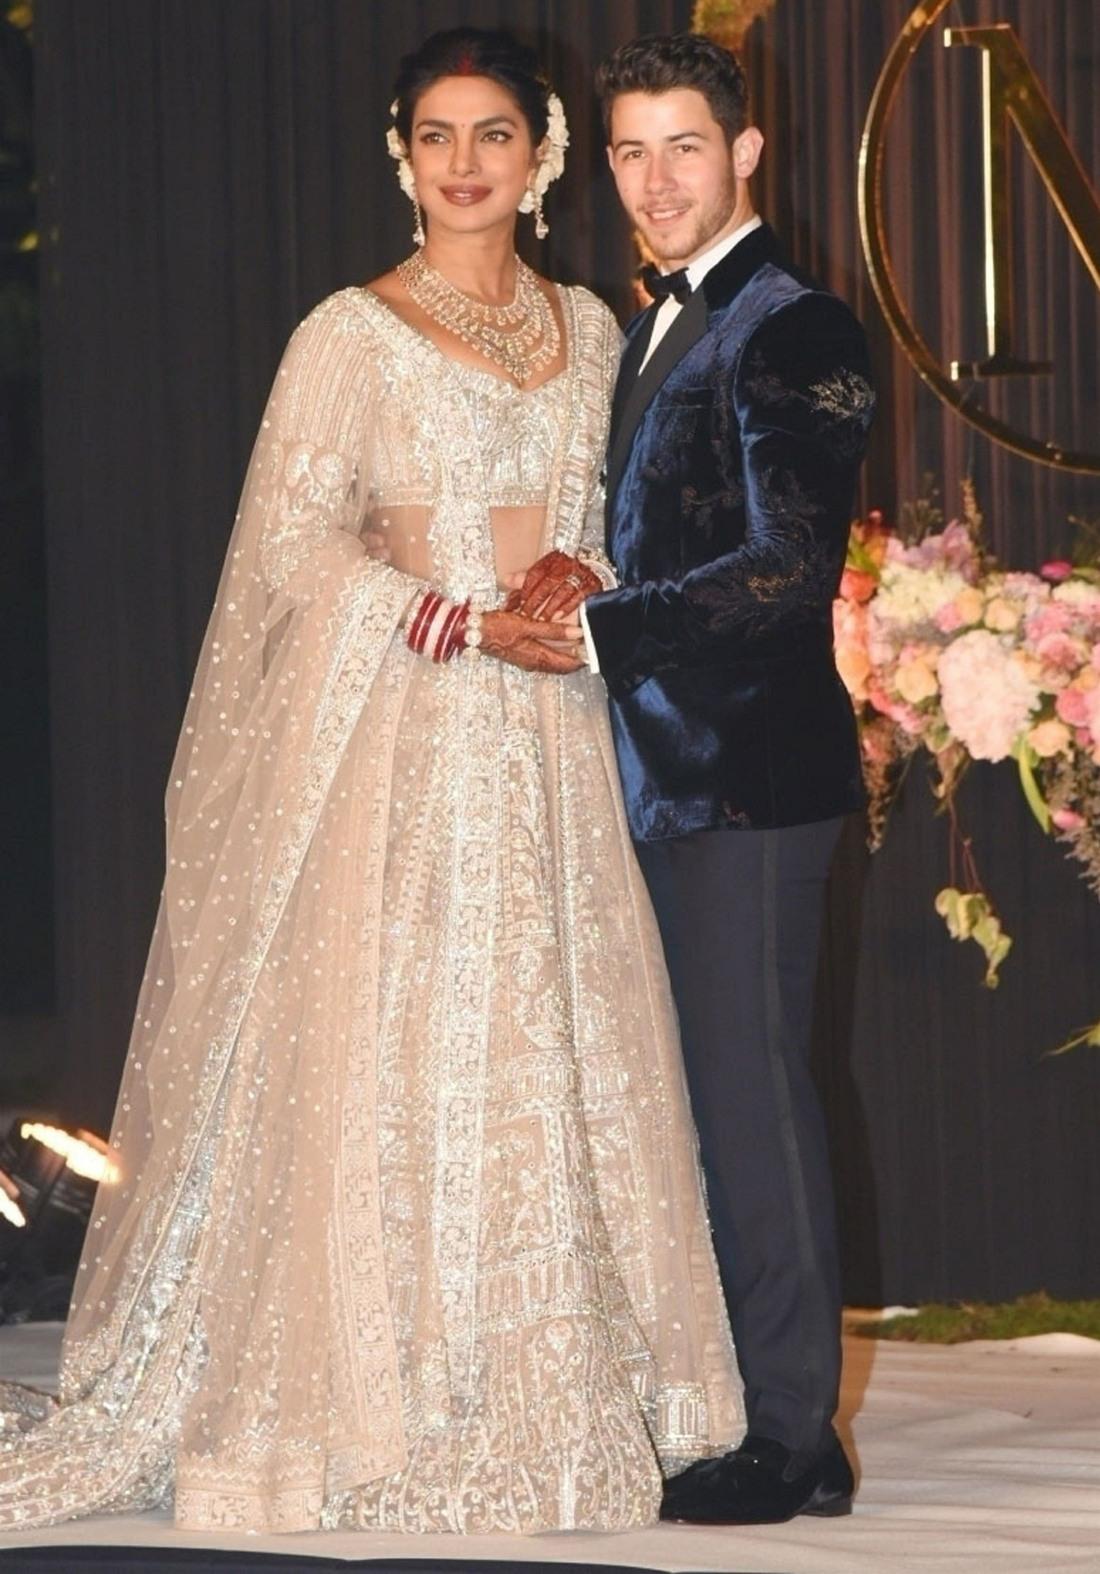 Priyanka Chopra and Nick Jonas pose for pictures at their wedding reception